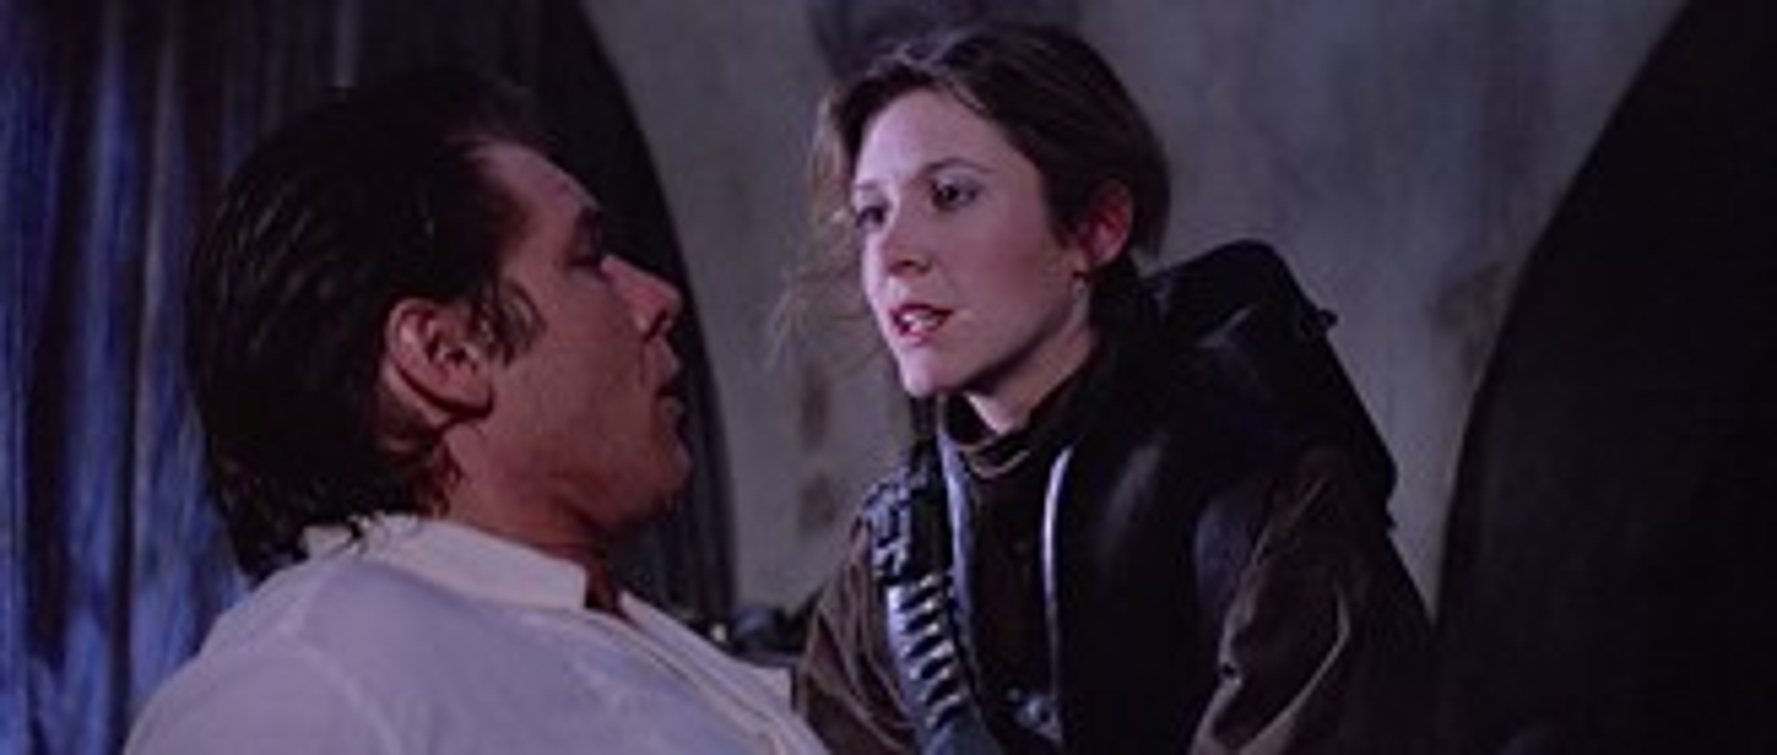 Star Wars, Episódio VI: O Retorno do Jedi